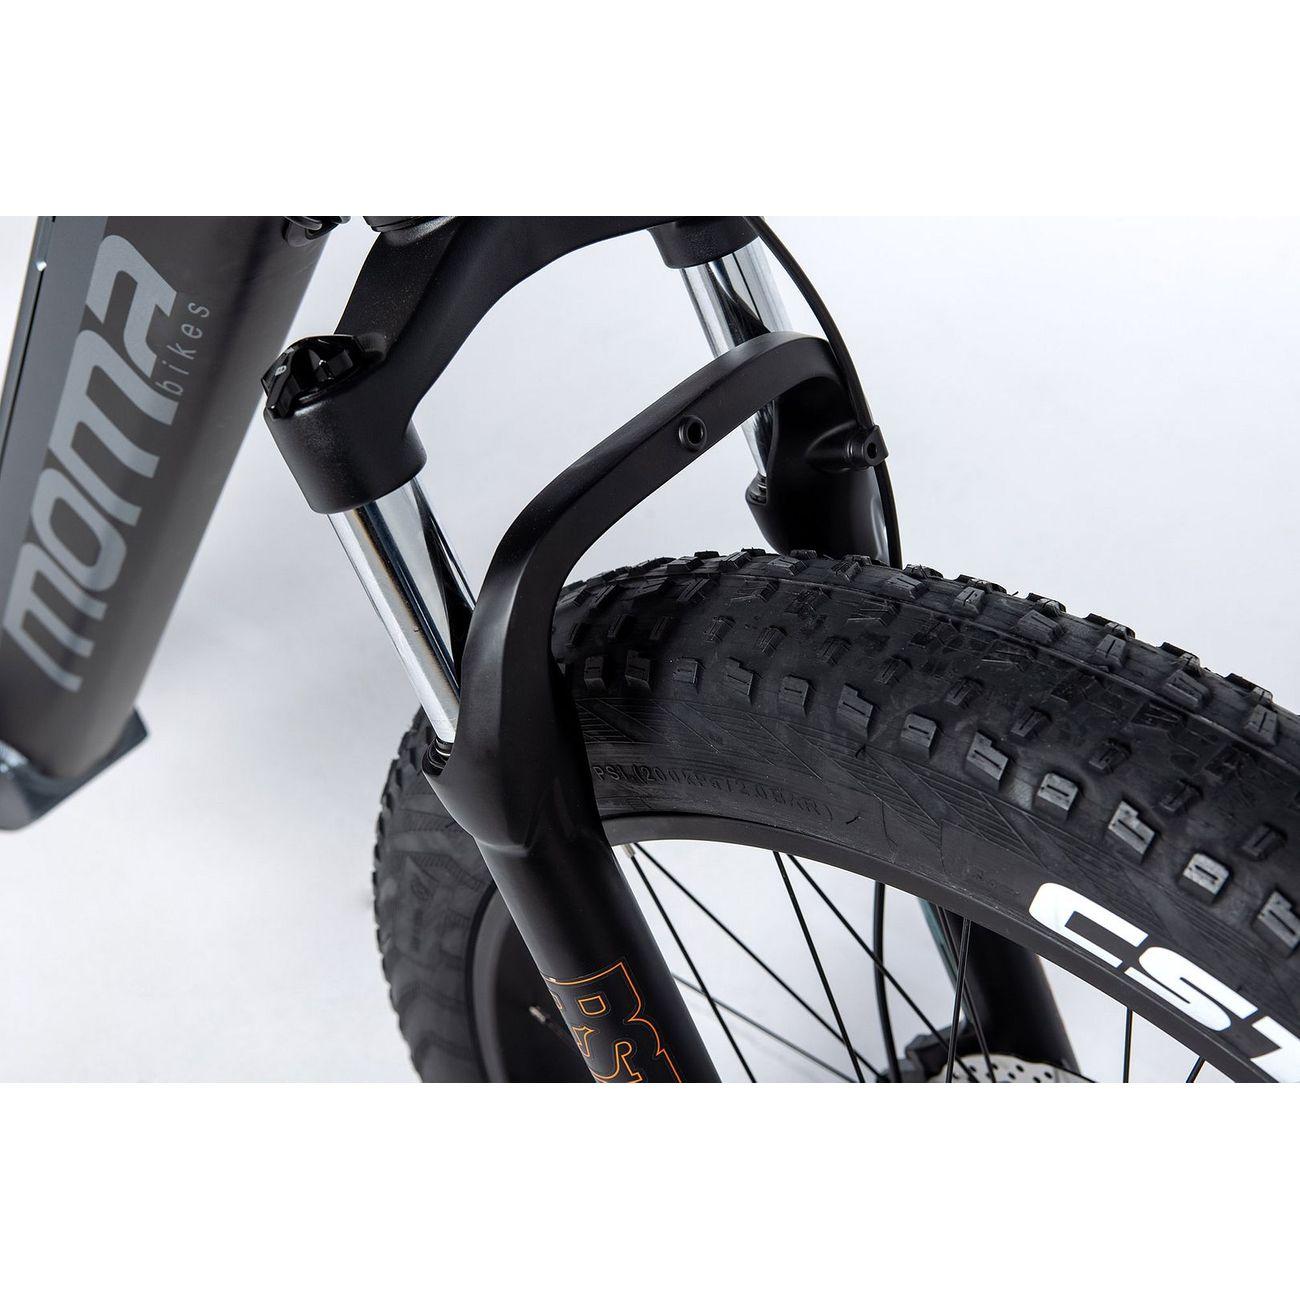 MOMABIKES VTT électrique Fatbike 26PRO, Full SHIMANO, Freins à disques Hydrauliques